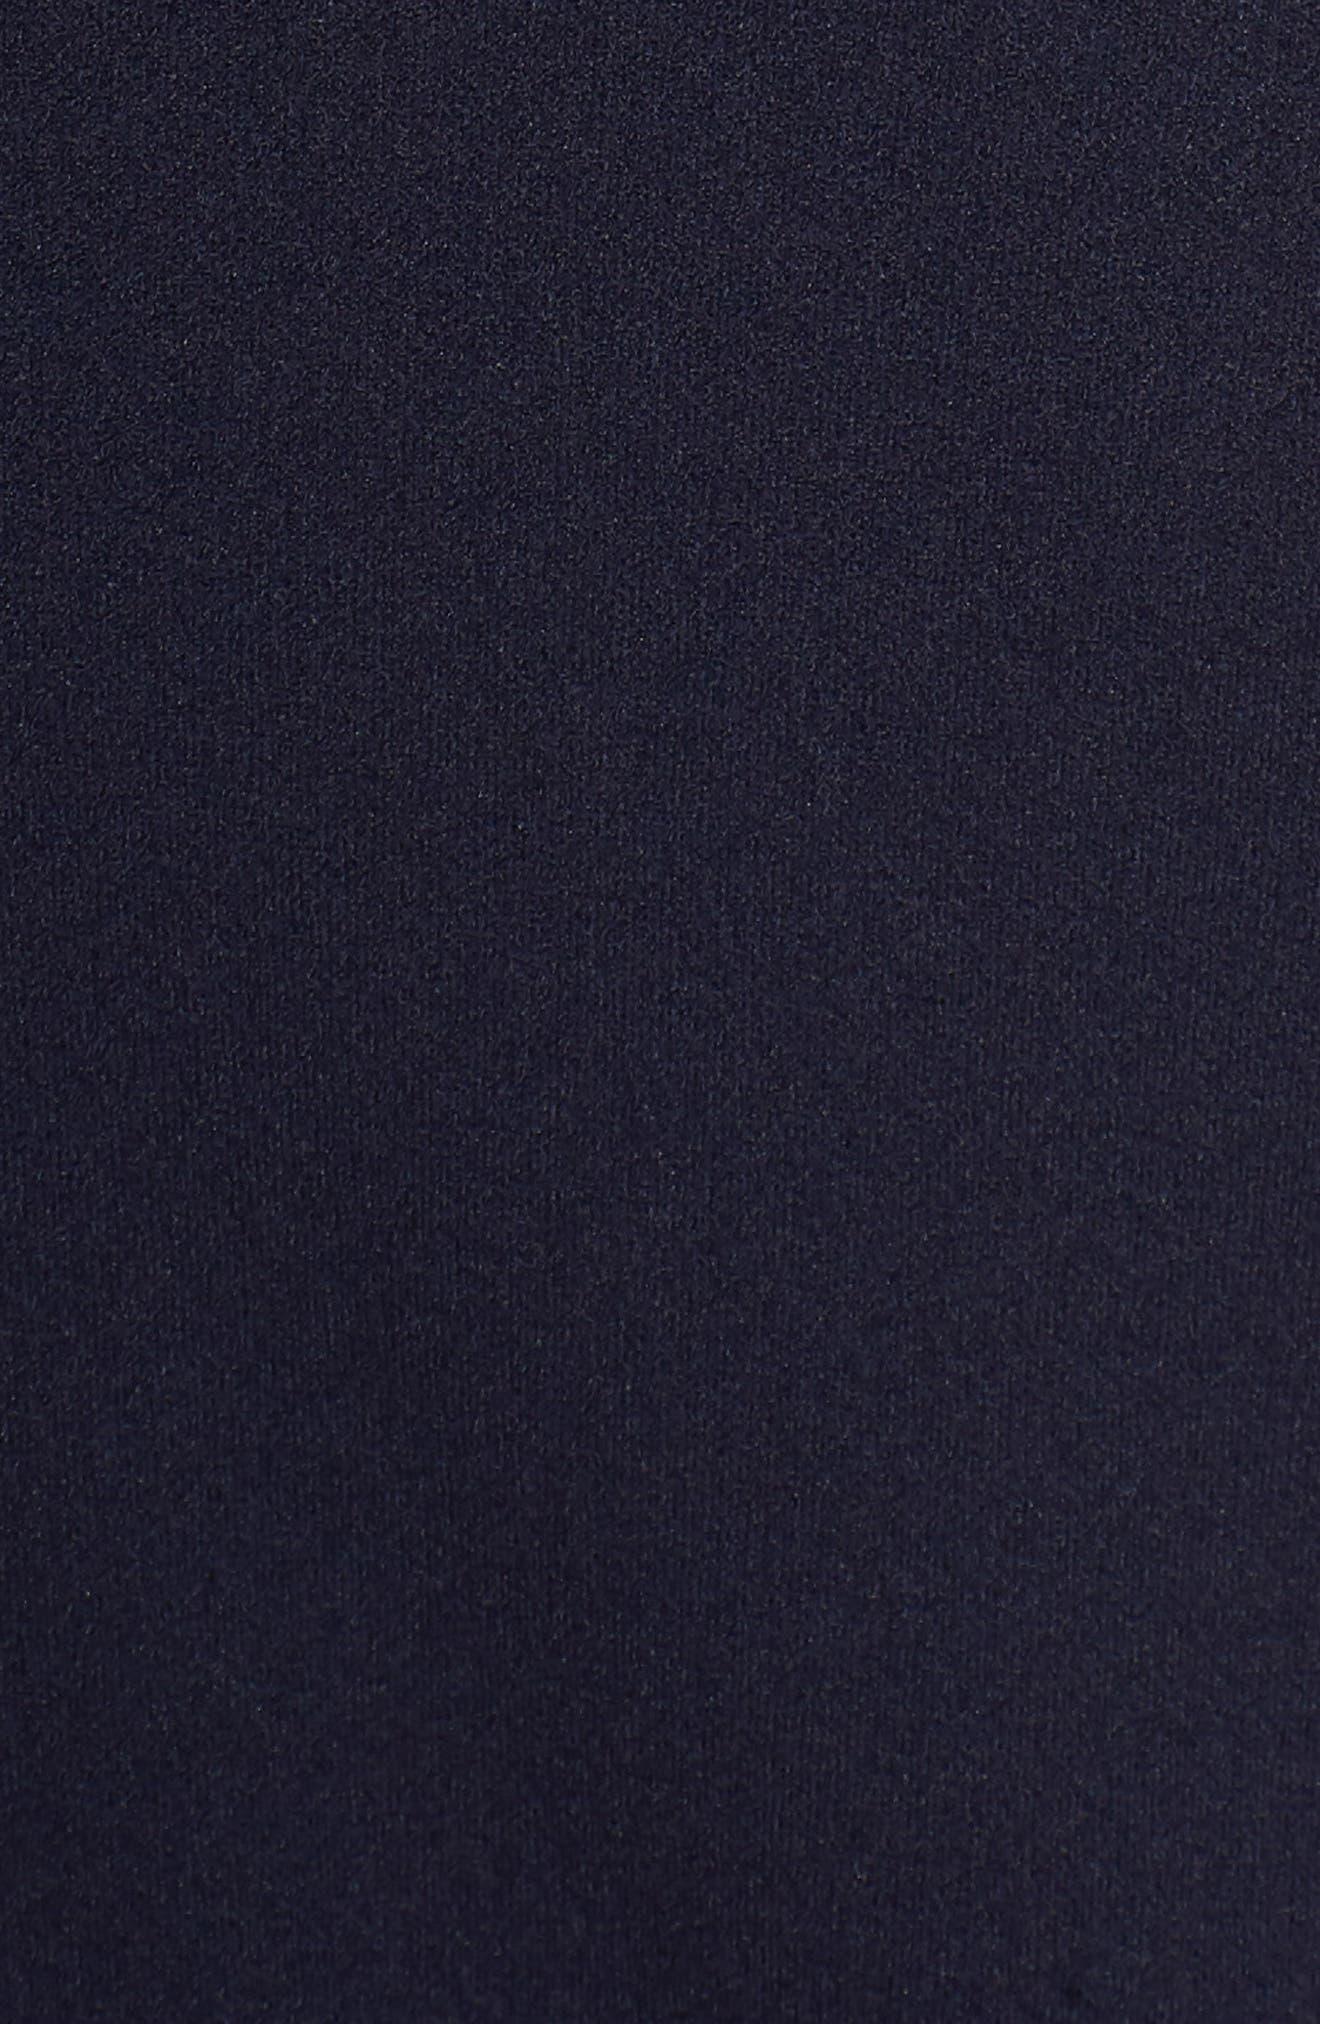 Lace-Up Skater Dress,                             Alternate thumbnail 6, color,                             407